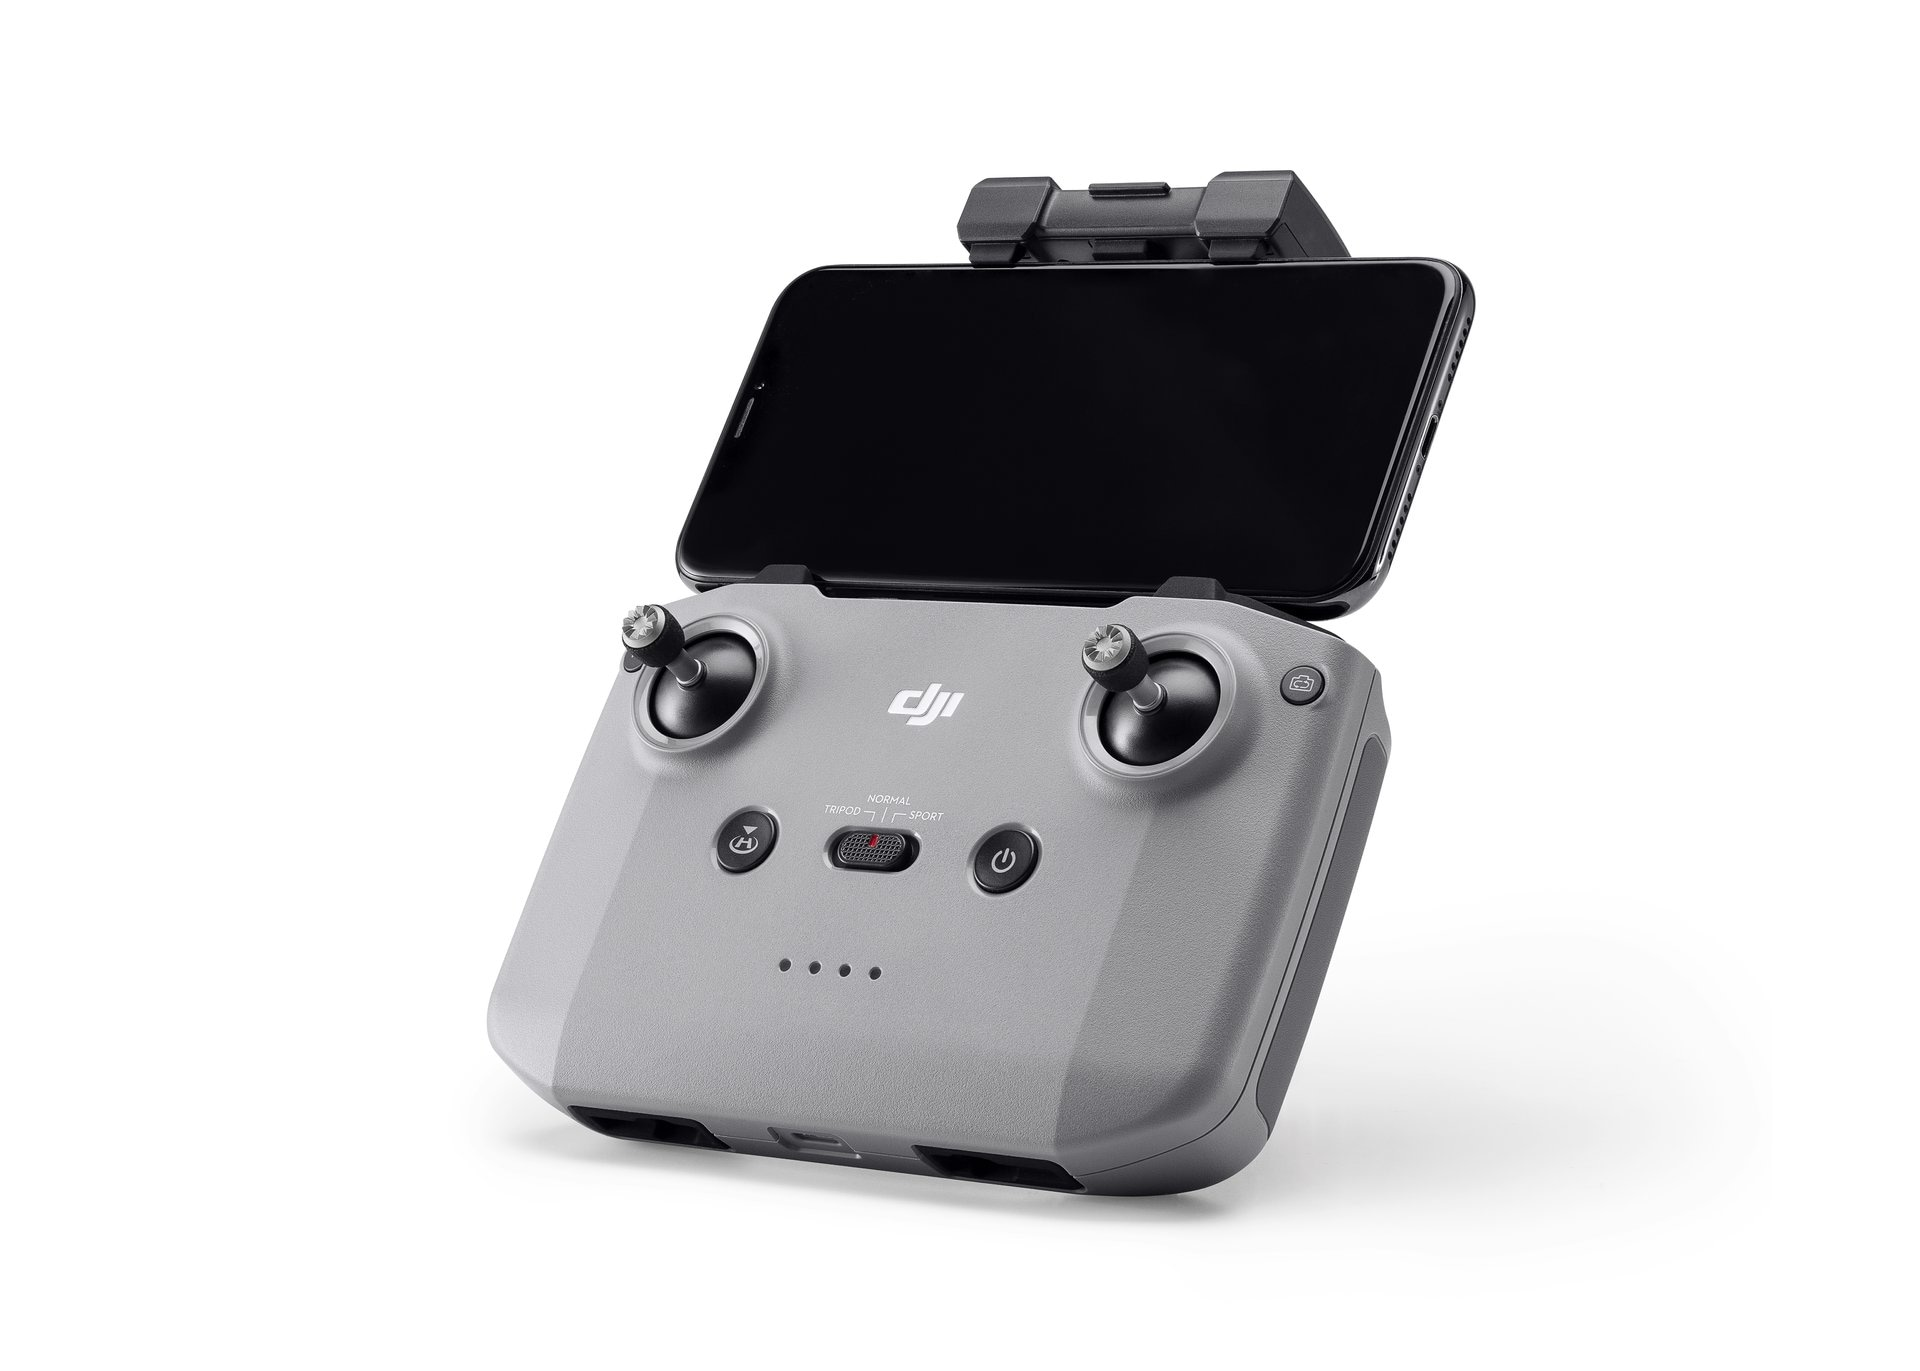 dji mavic air 2 controller and accessories press render (7)